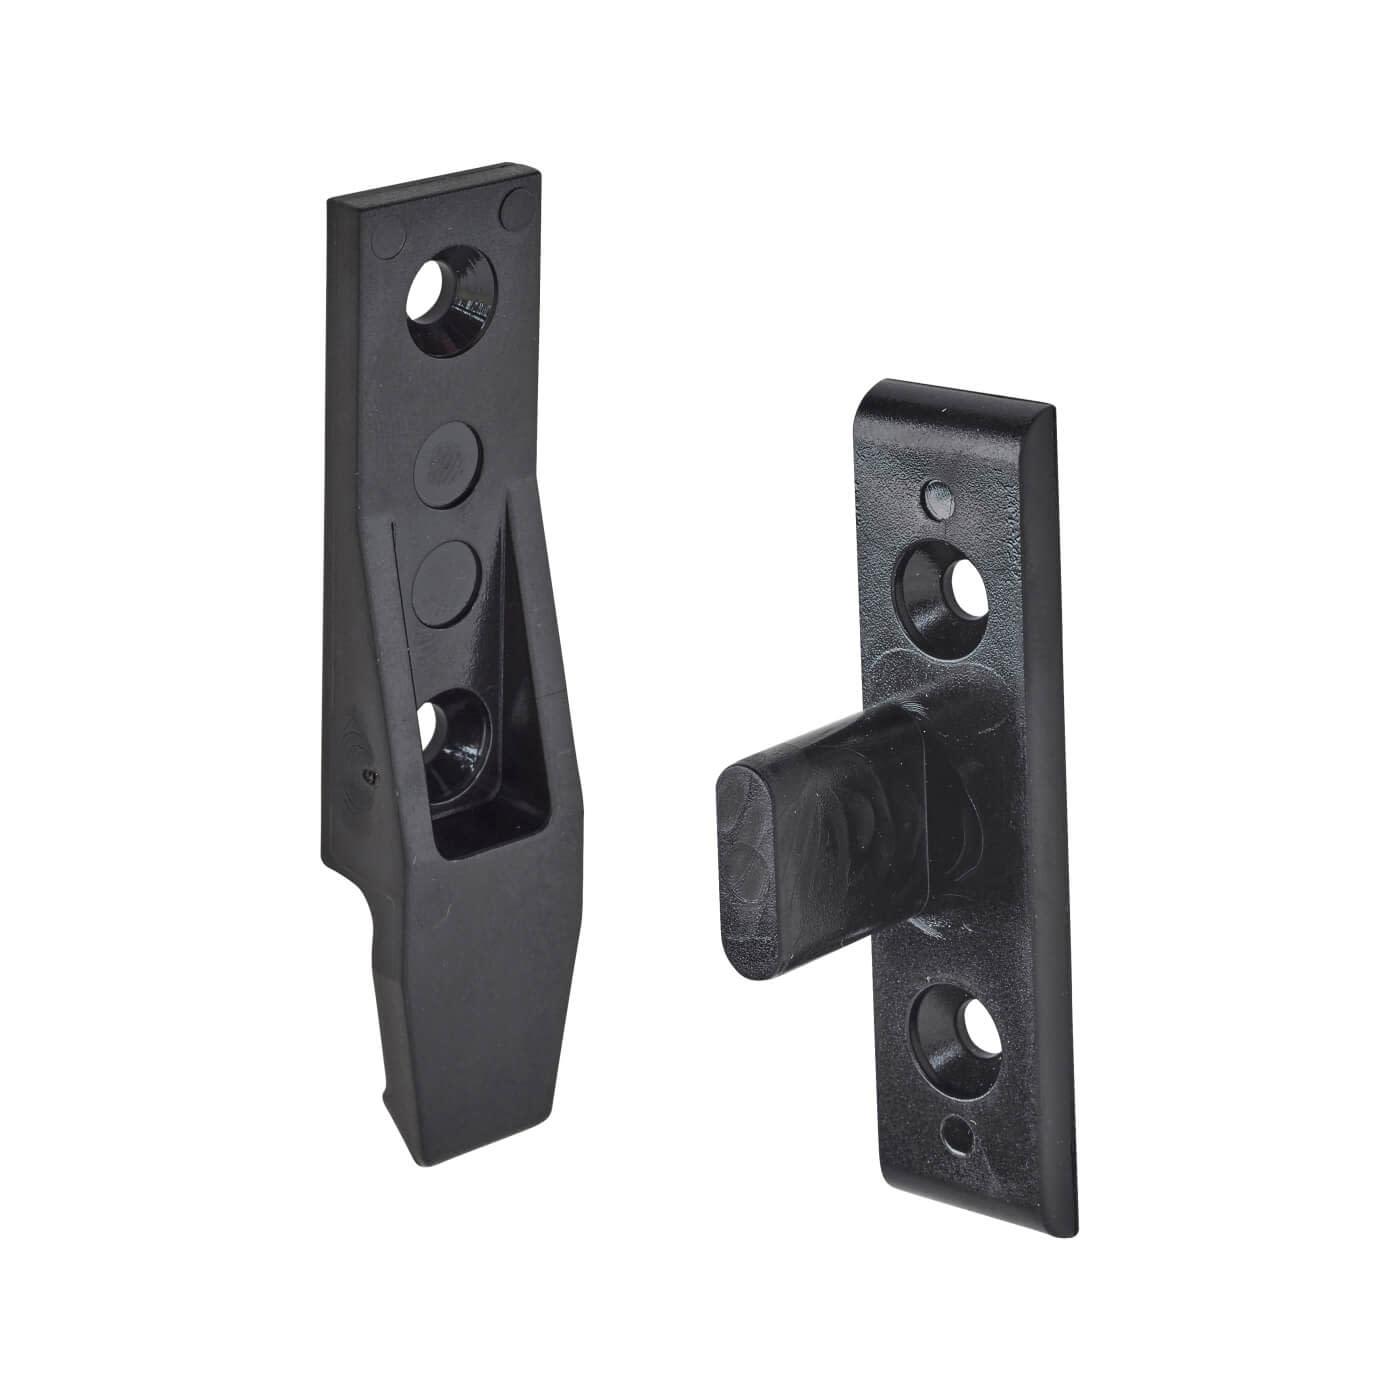 Keku Drop-on Clip - Frame and Panel Pack - Black - Pack 10)